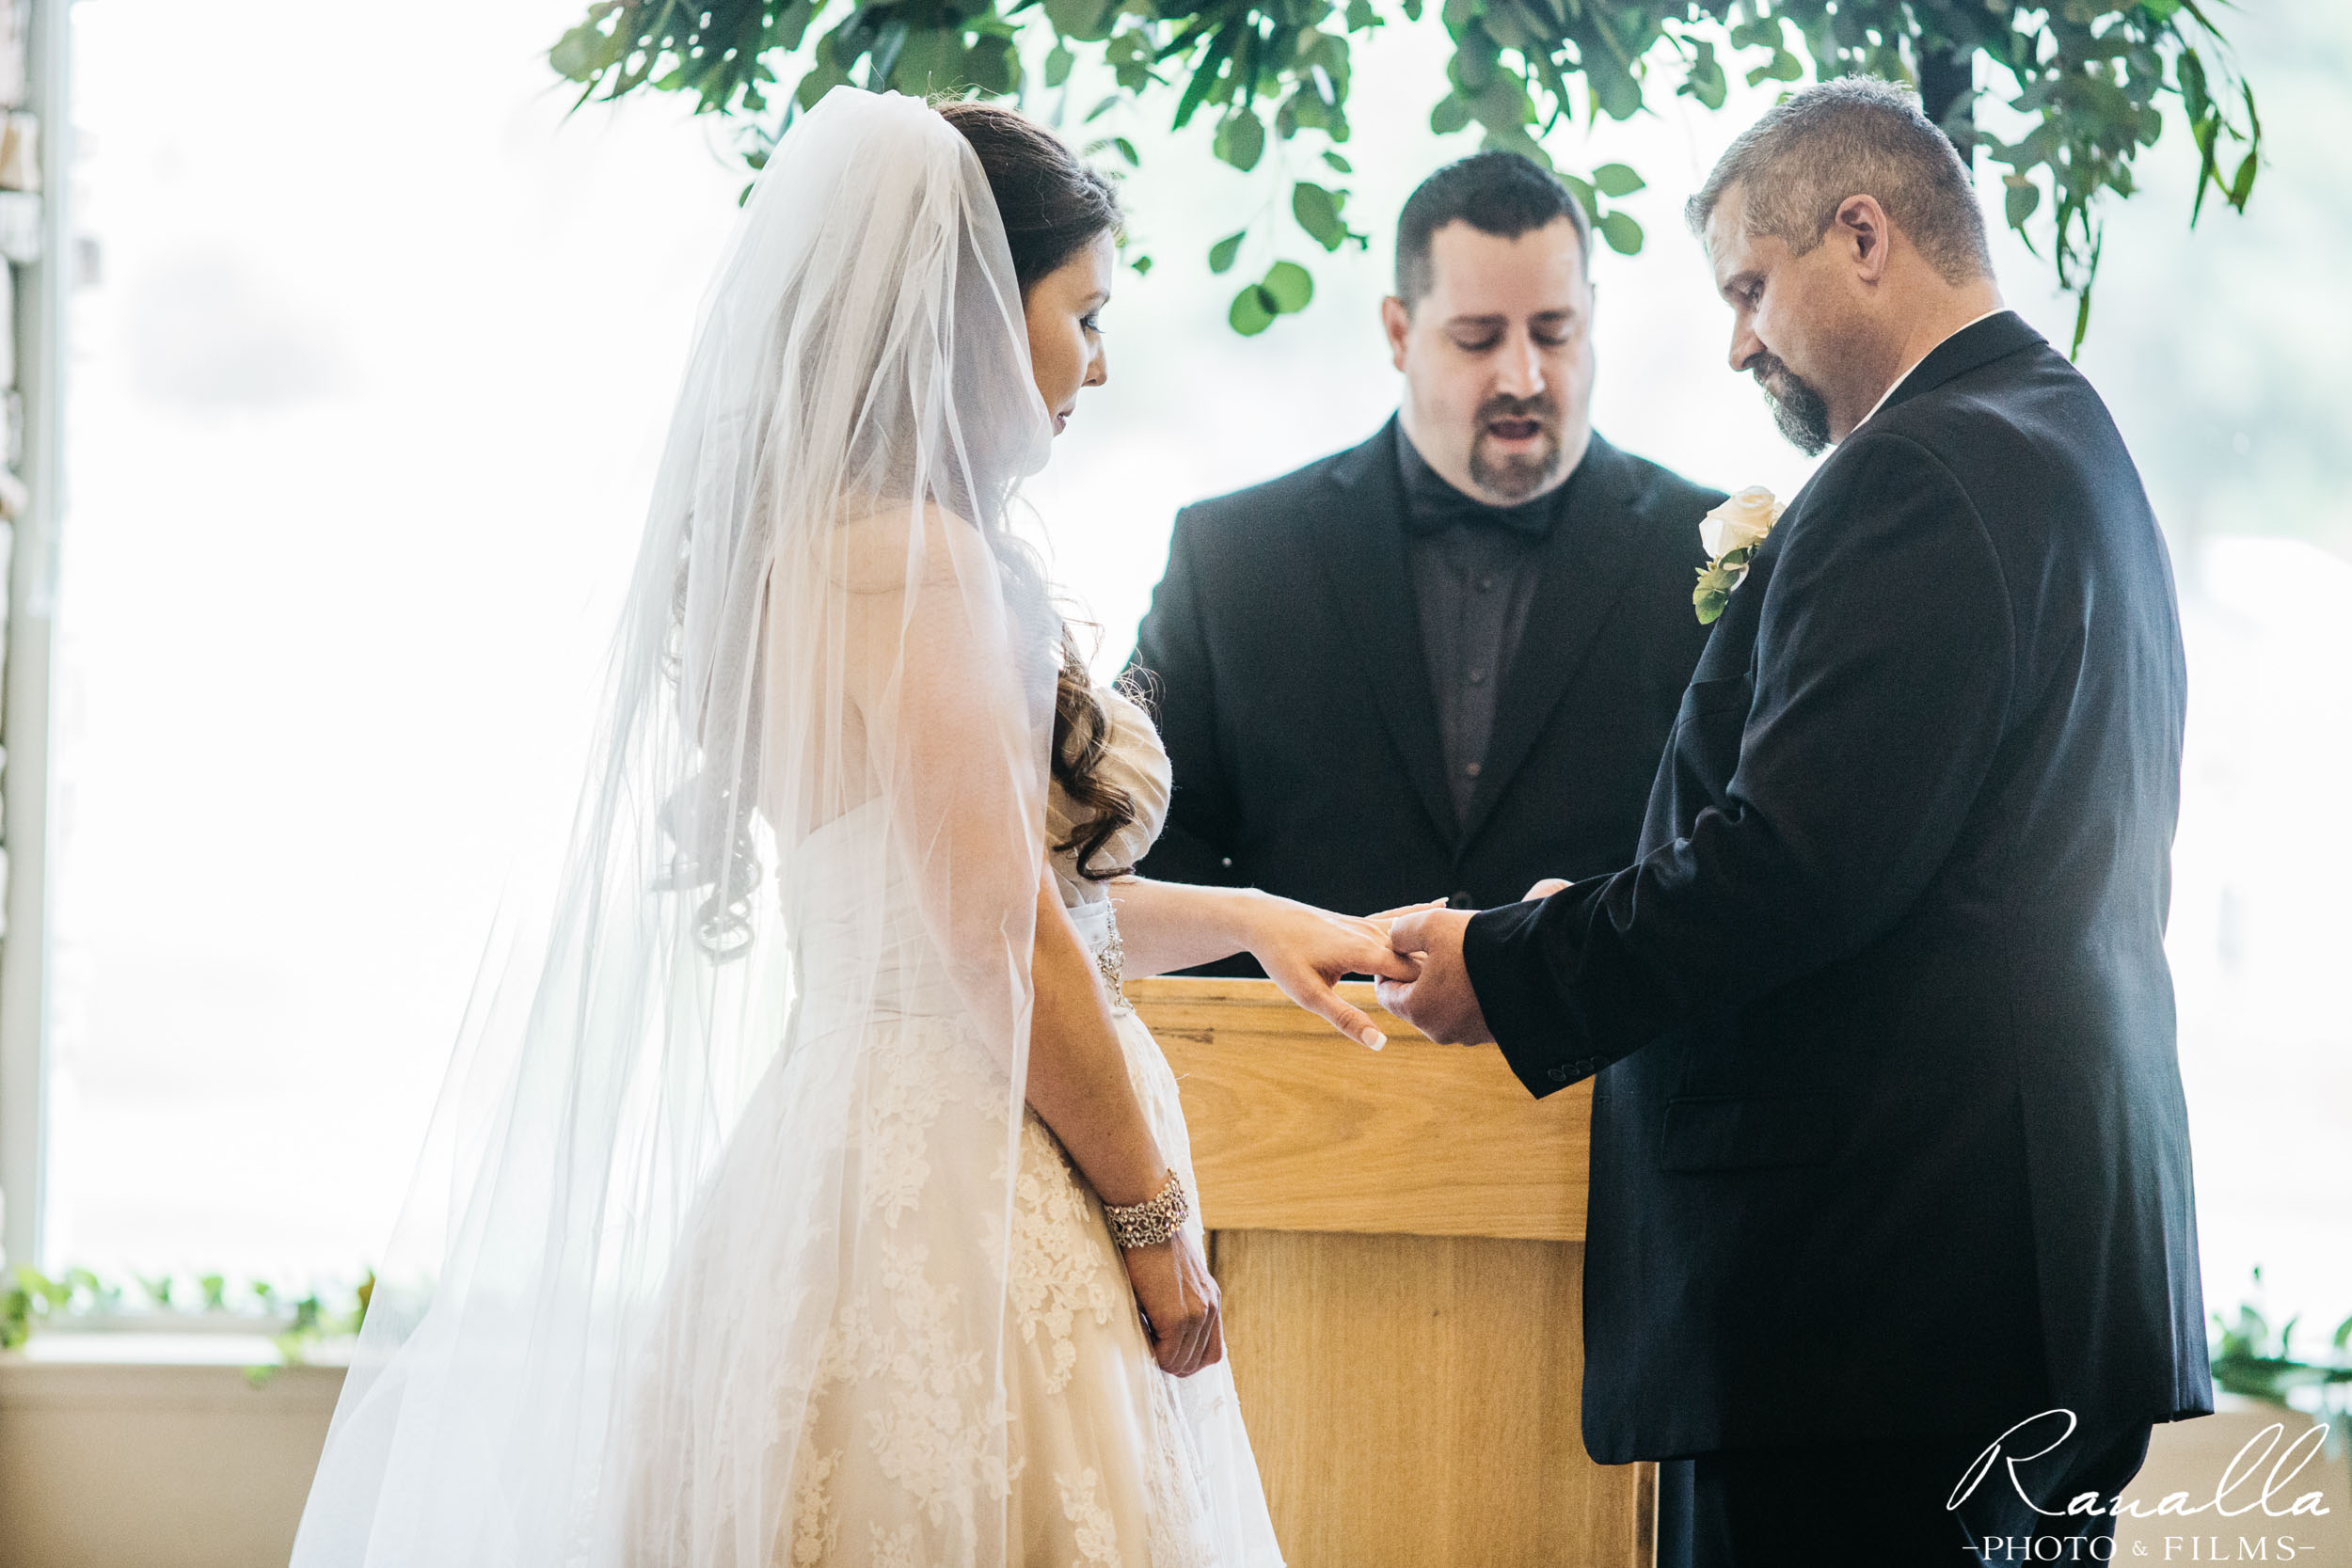 butte creek country club wedding - chico wedding photography - ranalla photo & films-629.jpg